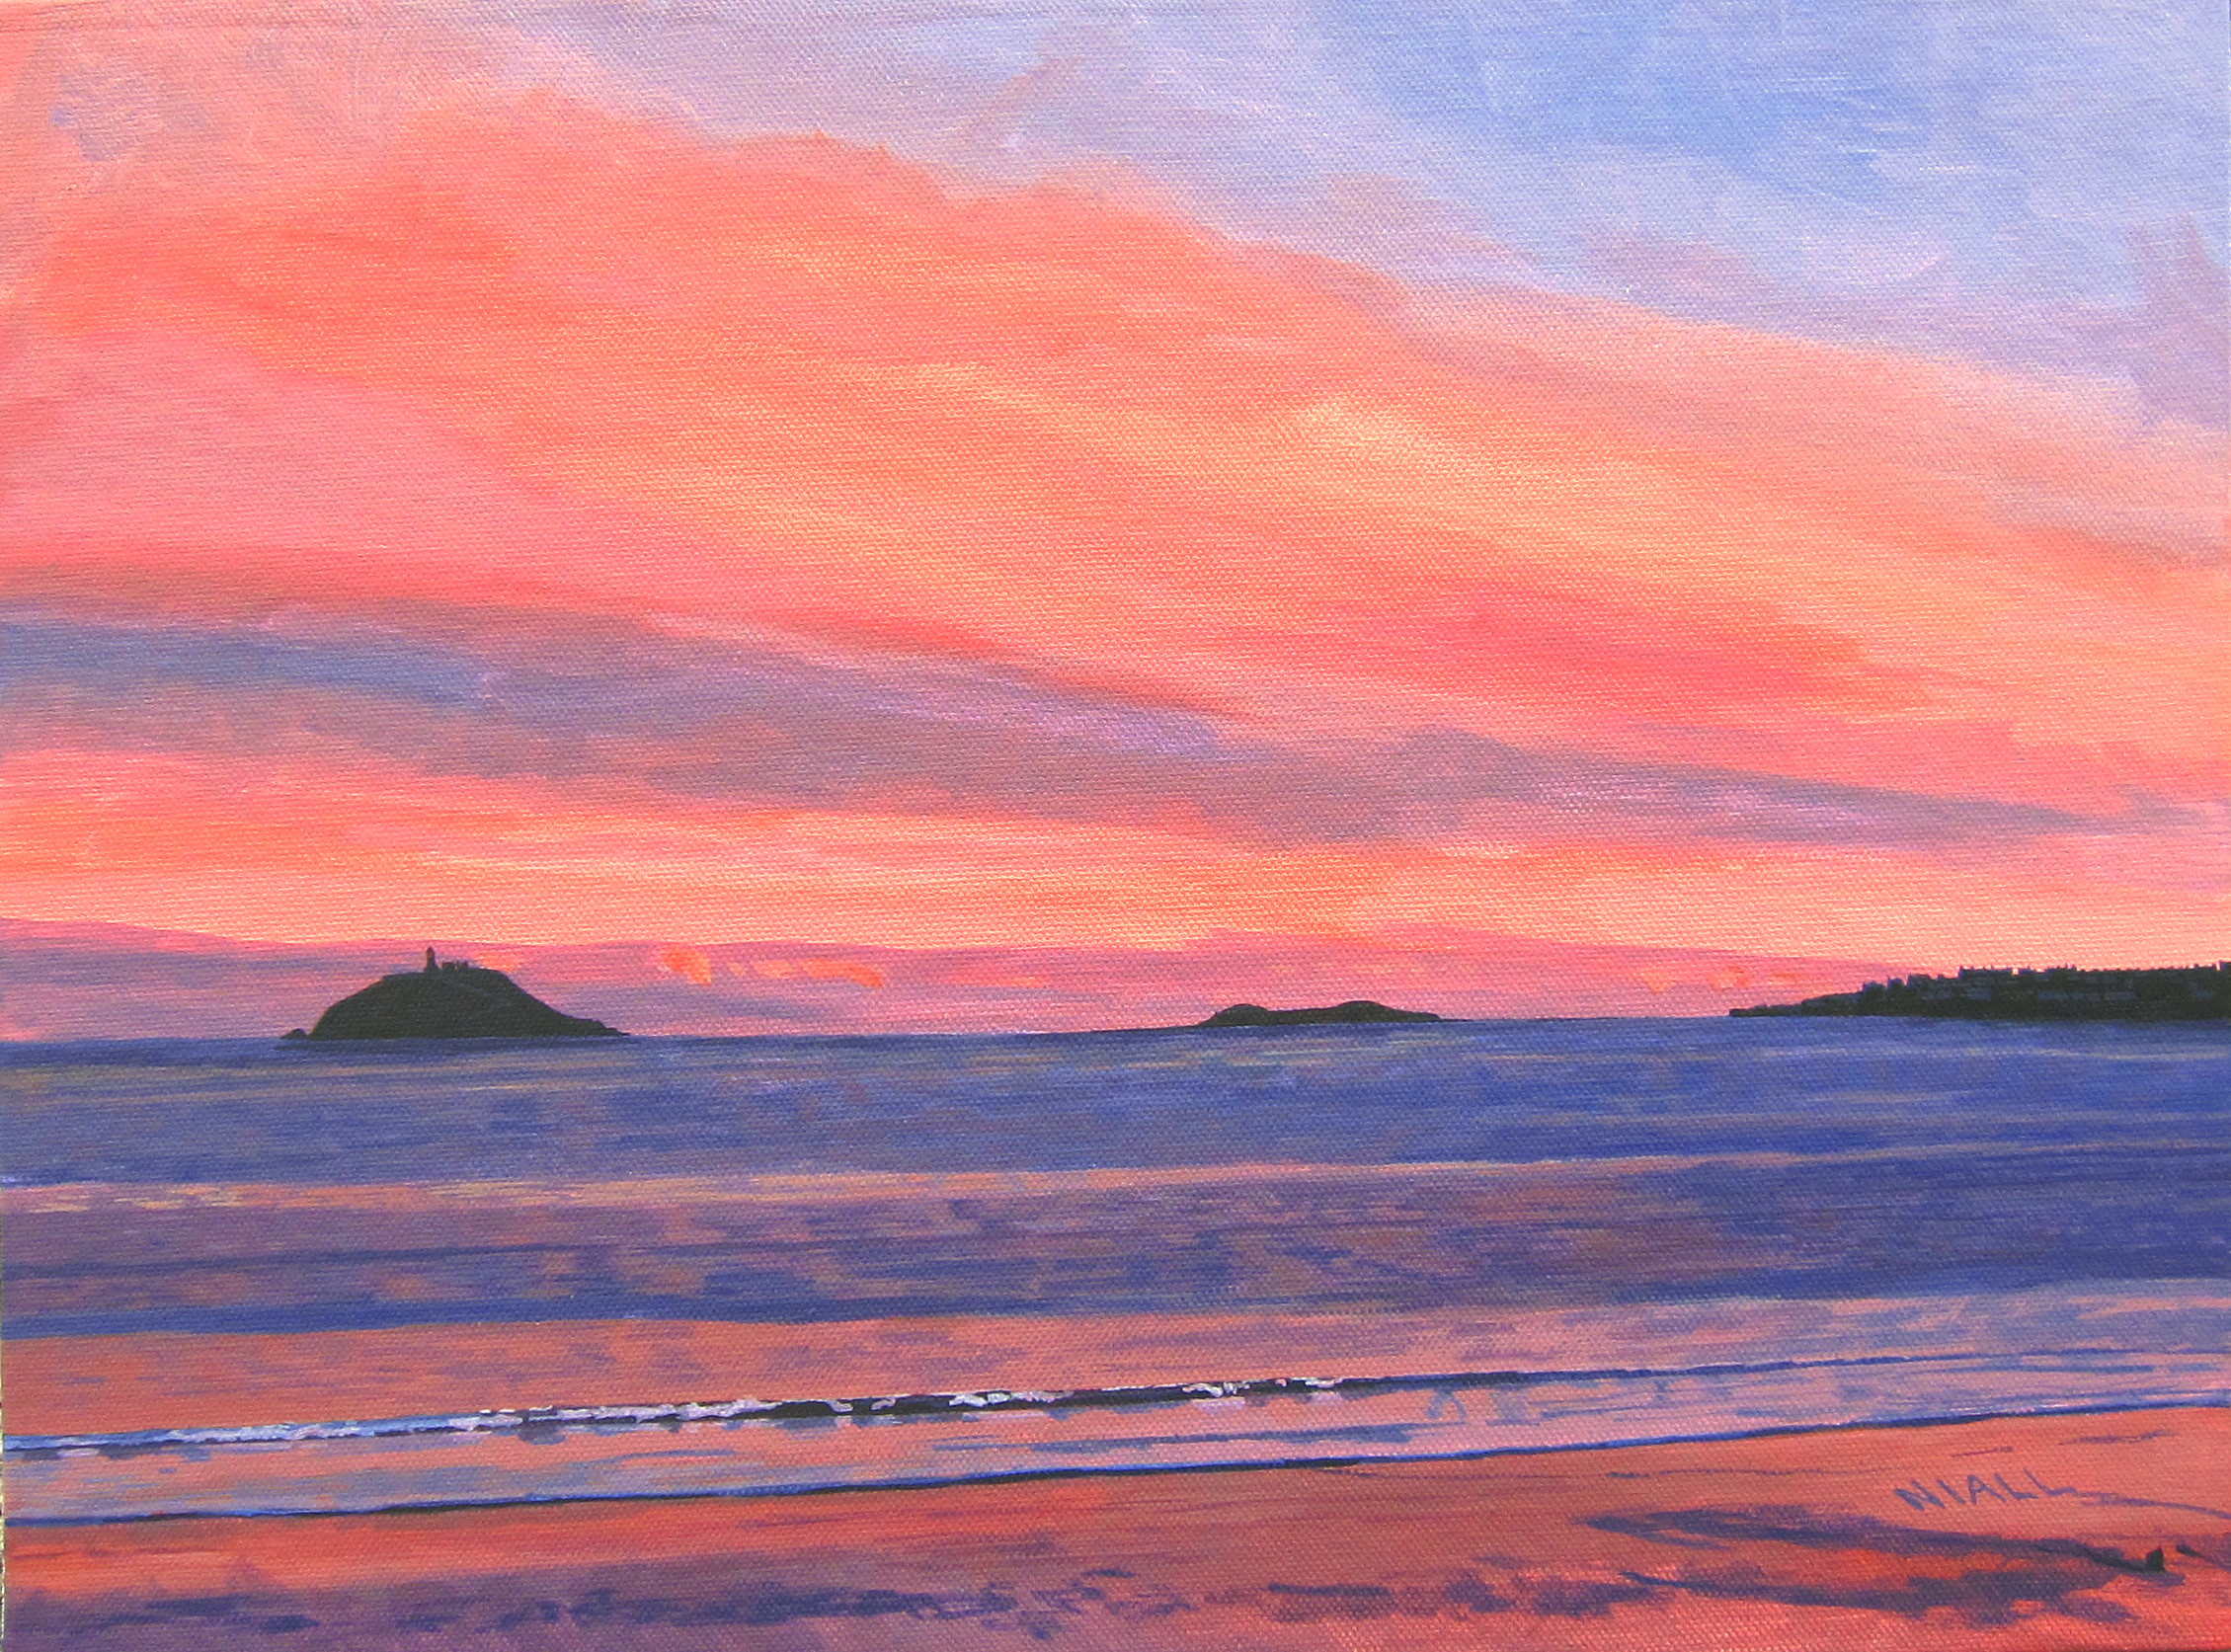 Sunset View of Ballycotton.